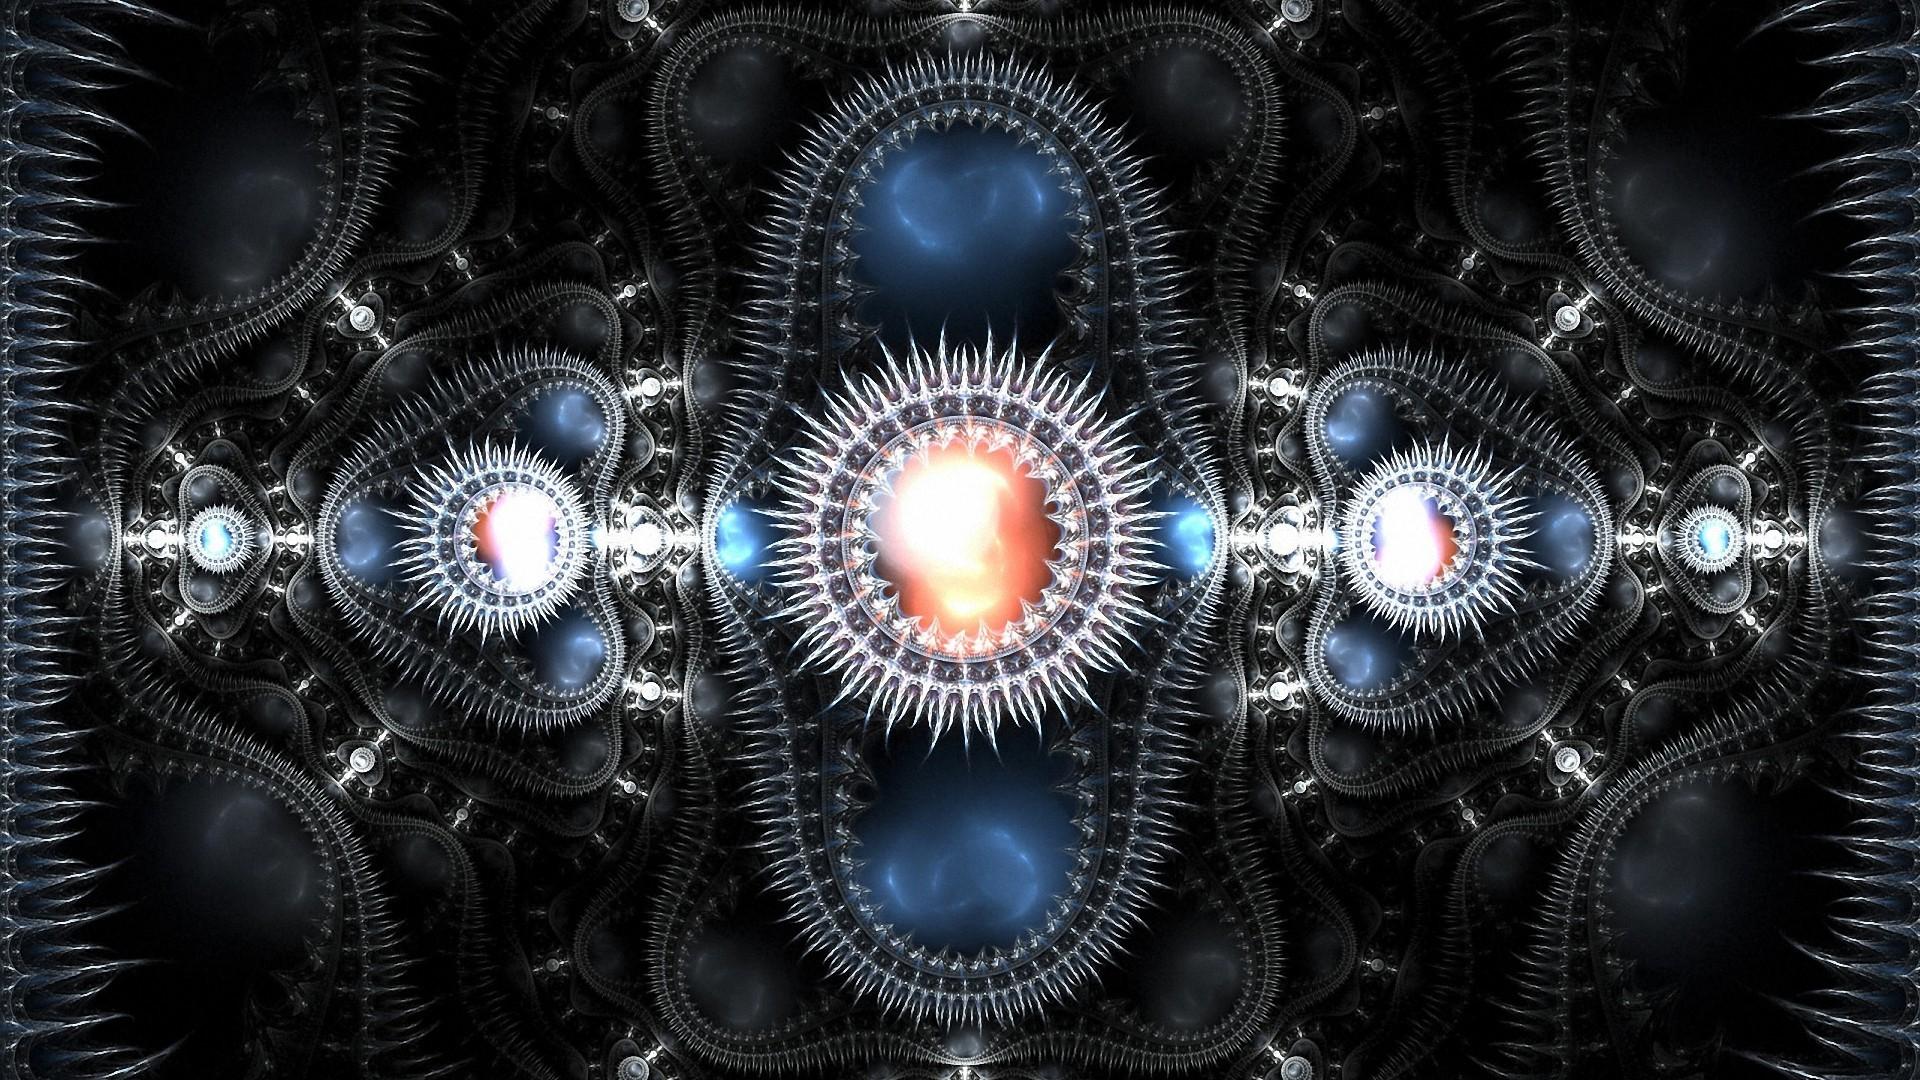 Weird Abstract Machine In Galaxy Wallpaper